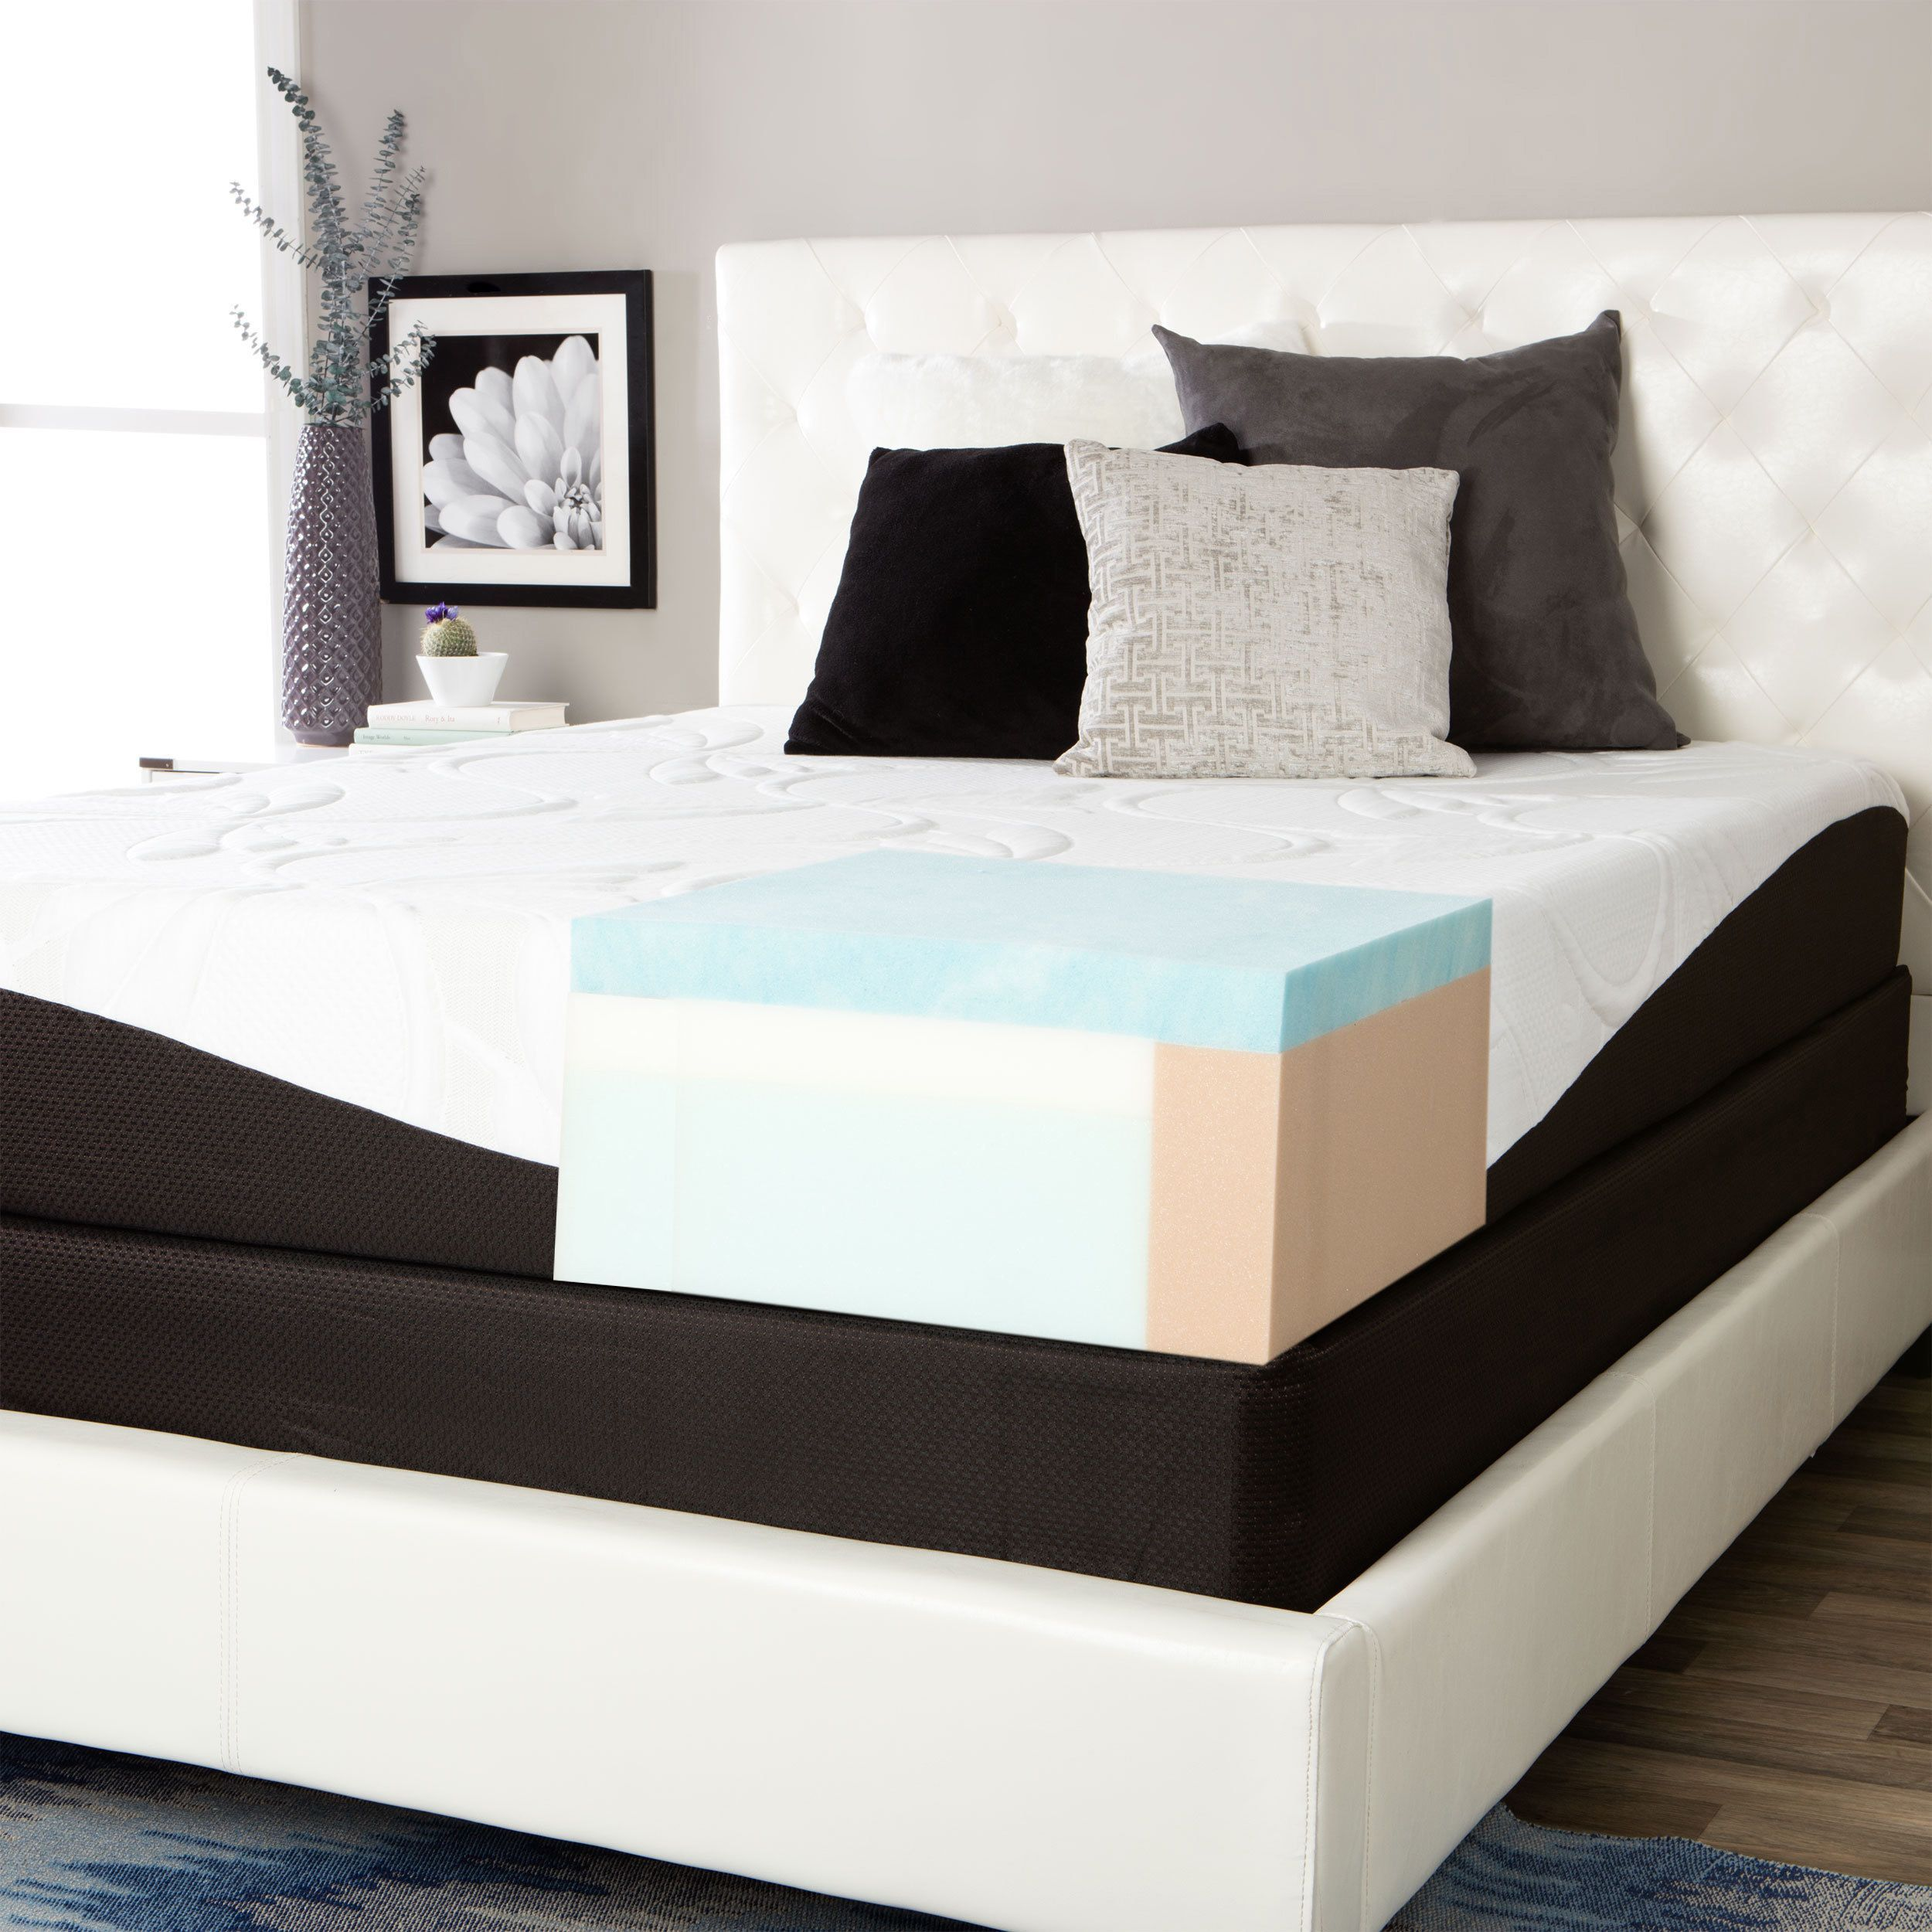 Comforpedic From Beautyrest Choose Your Comfort 10 Inch Gel Memory